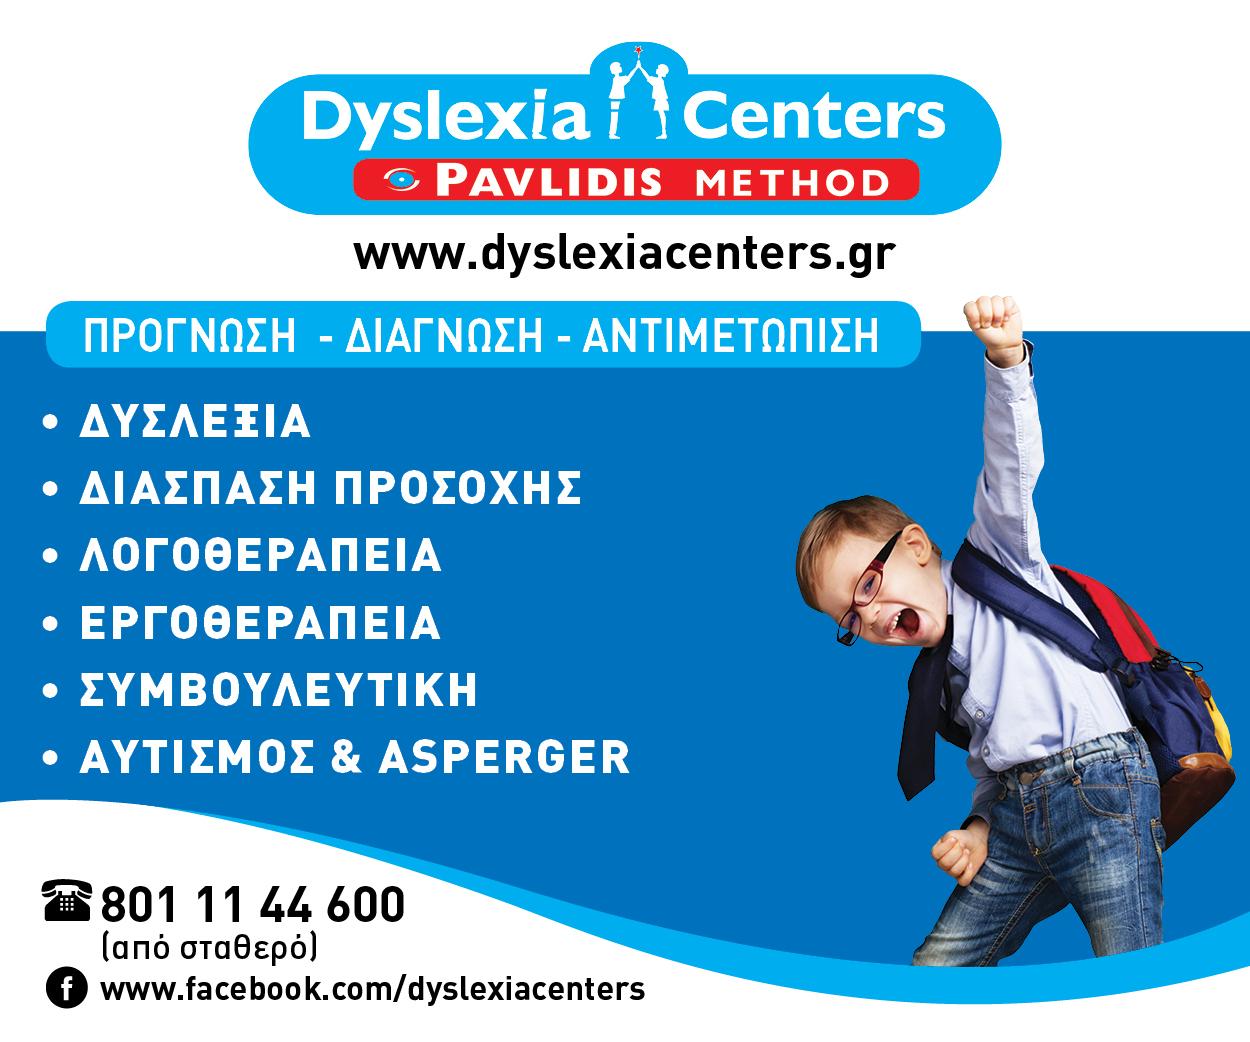 dyslexiacenters